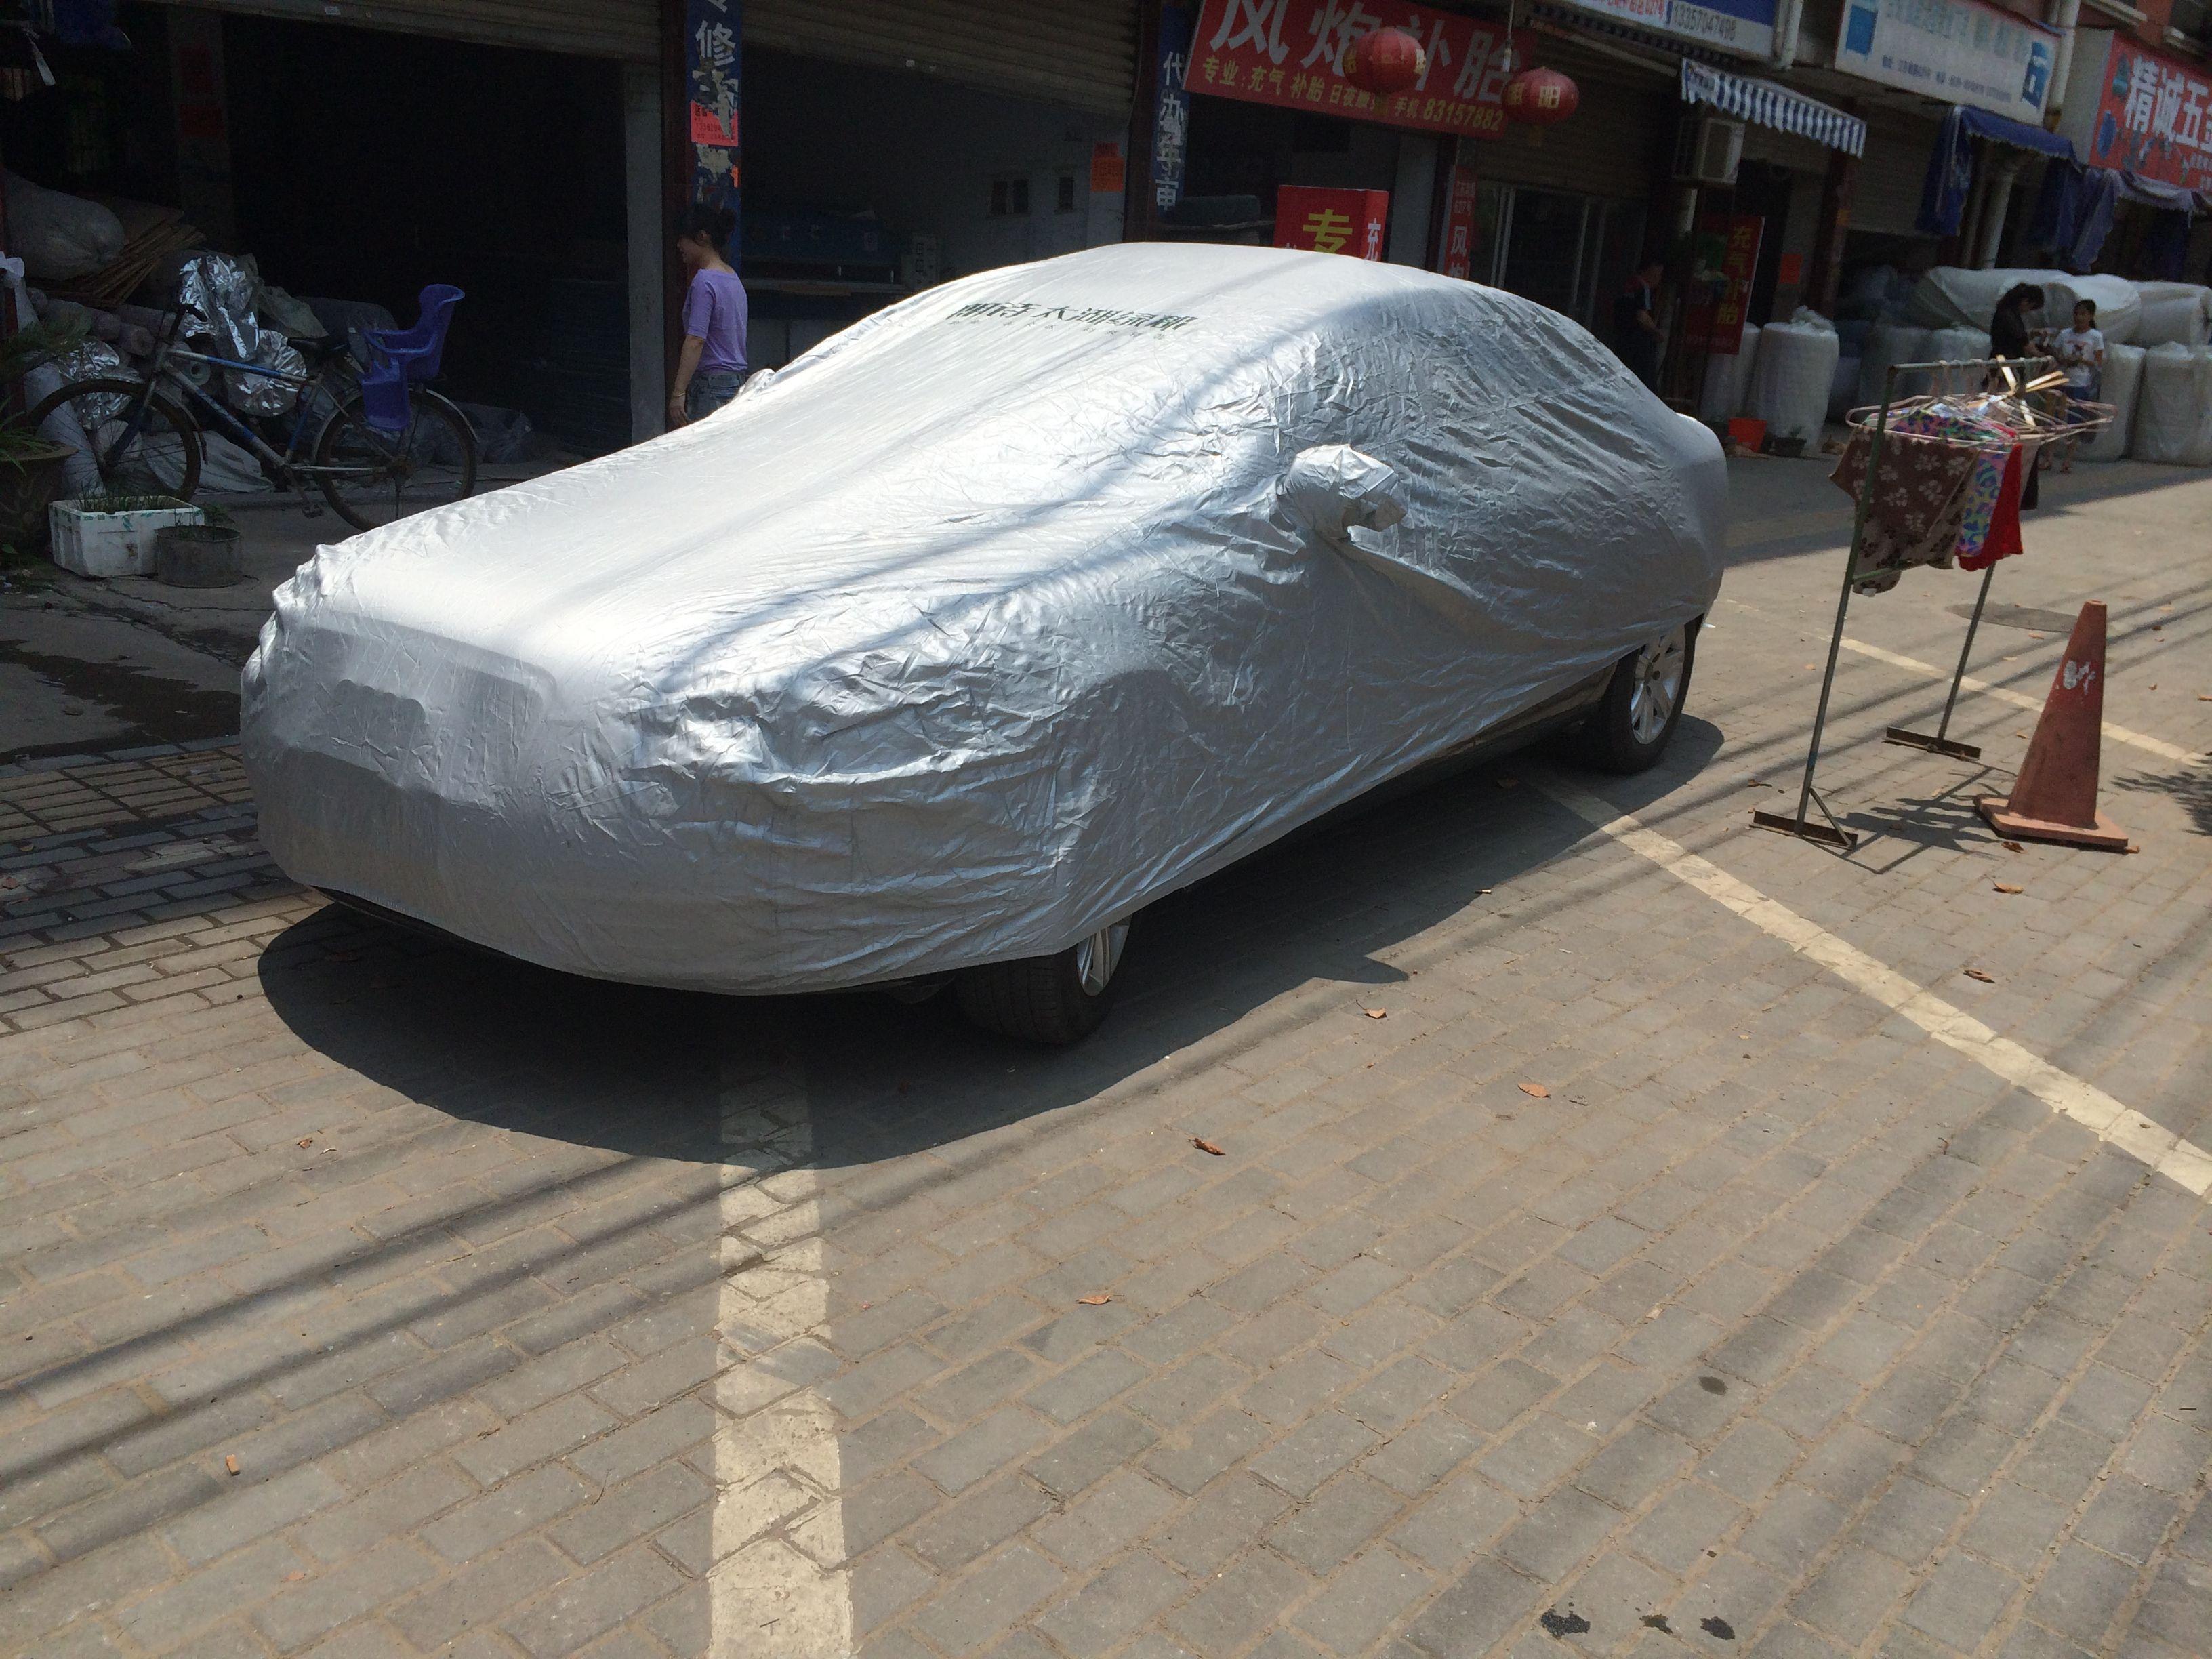 170T涤纶涂银汽车车衣 外贸热销款涤塔夫车衣罩 防尘汽车套